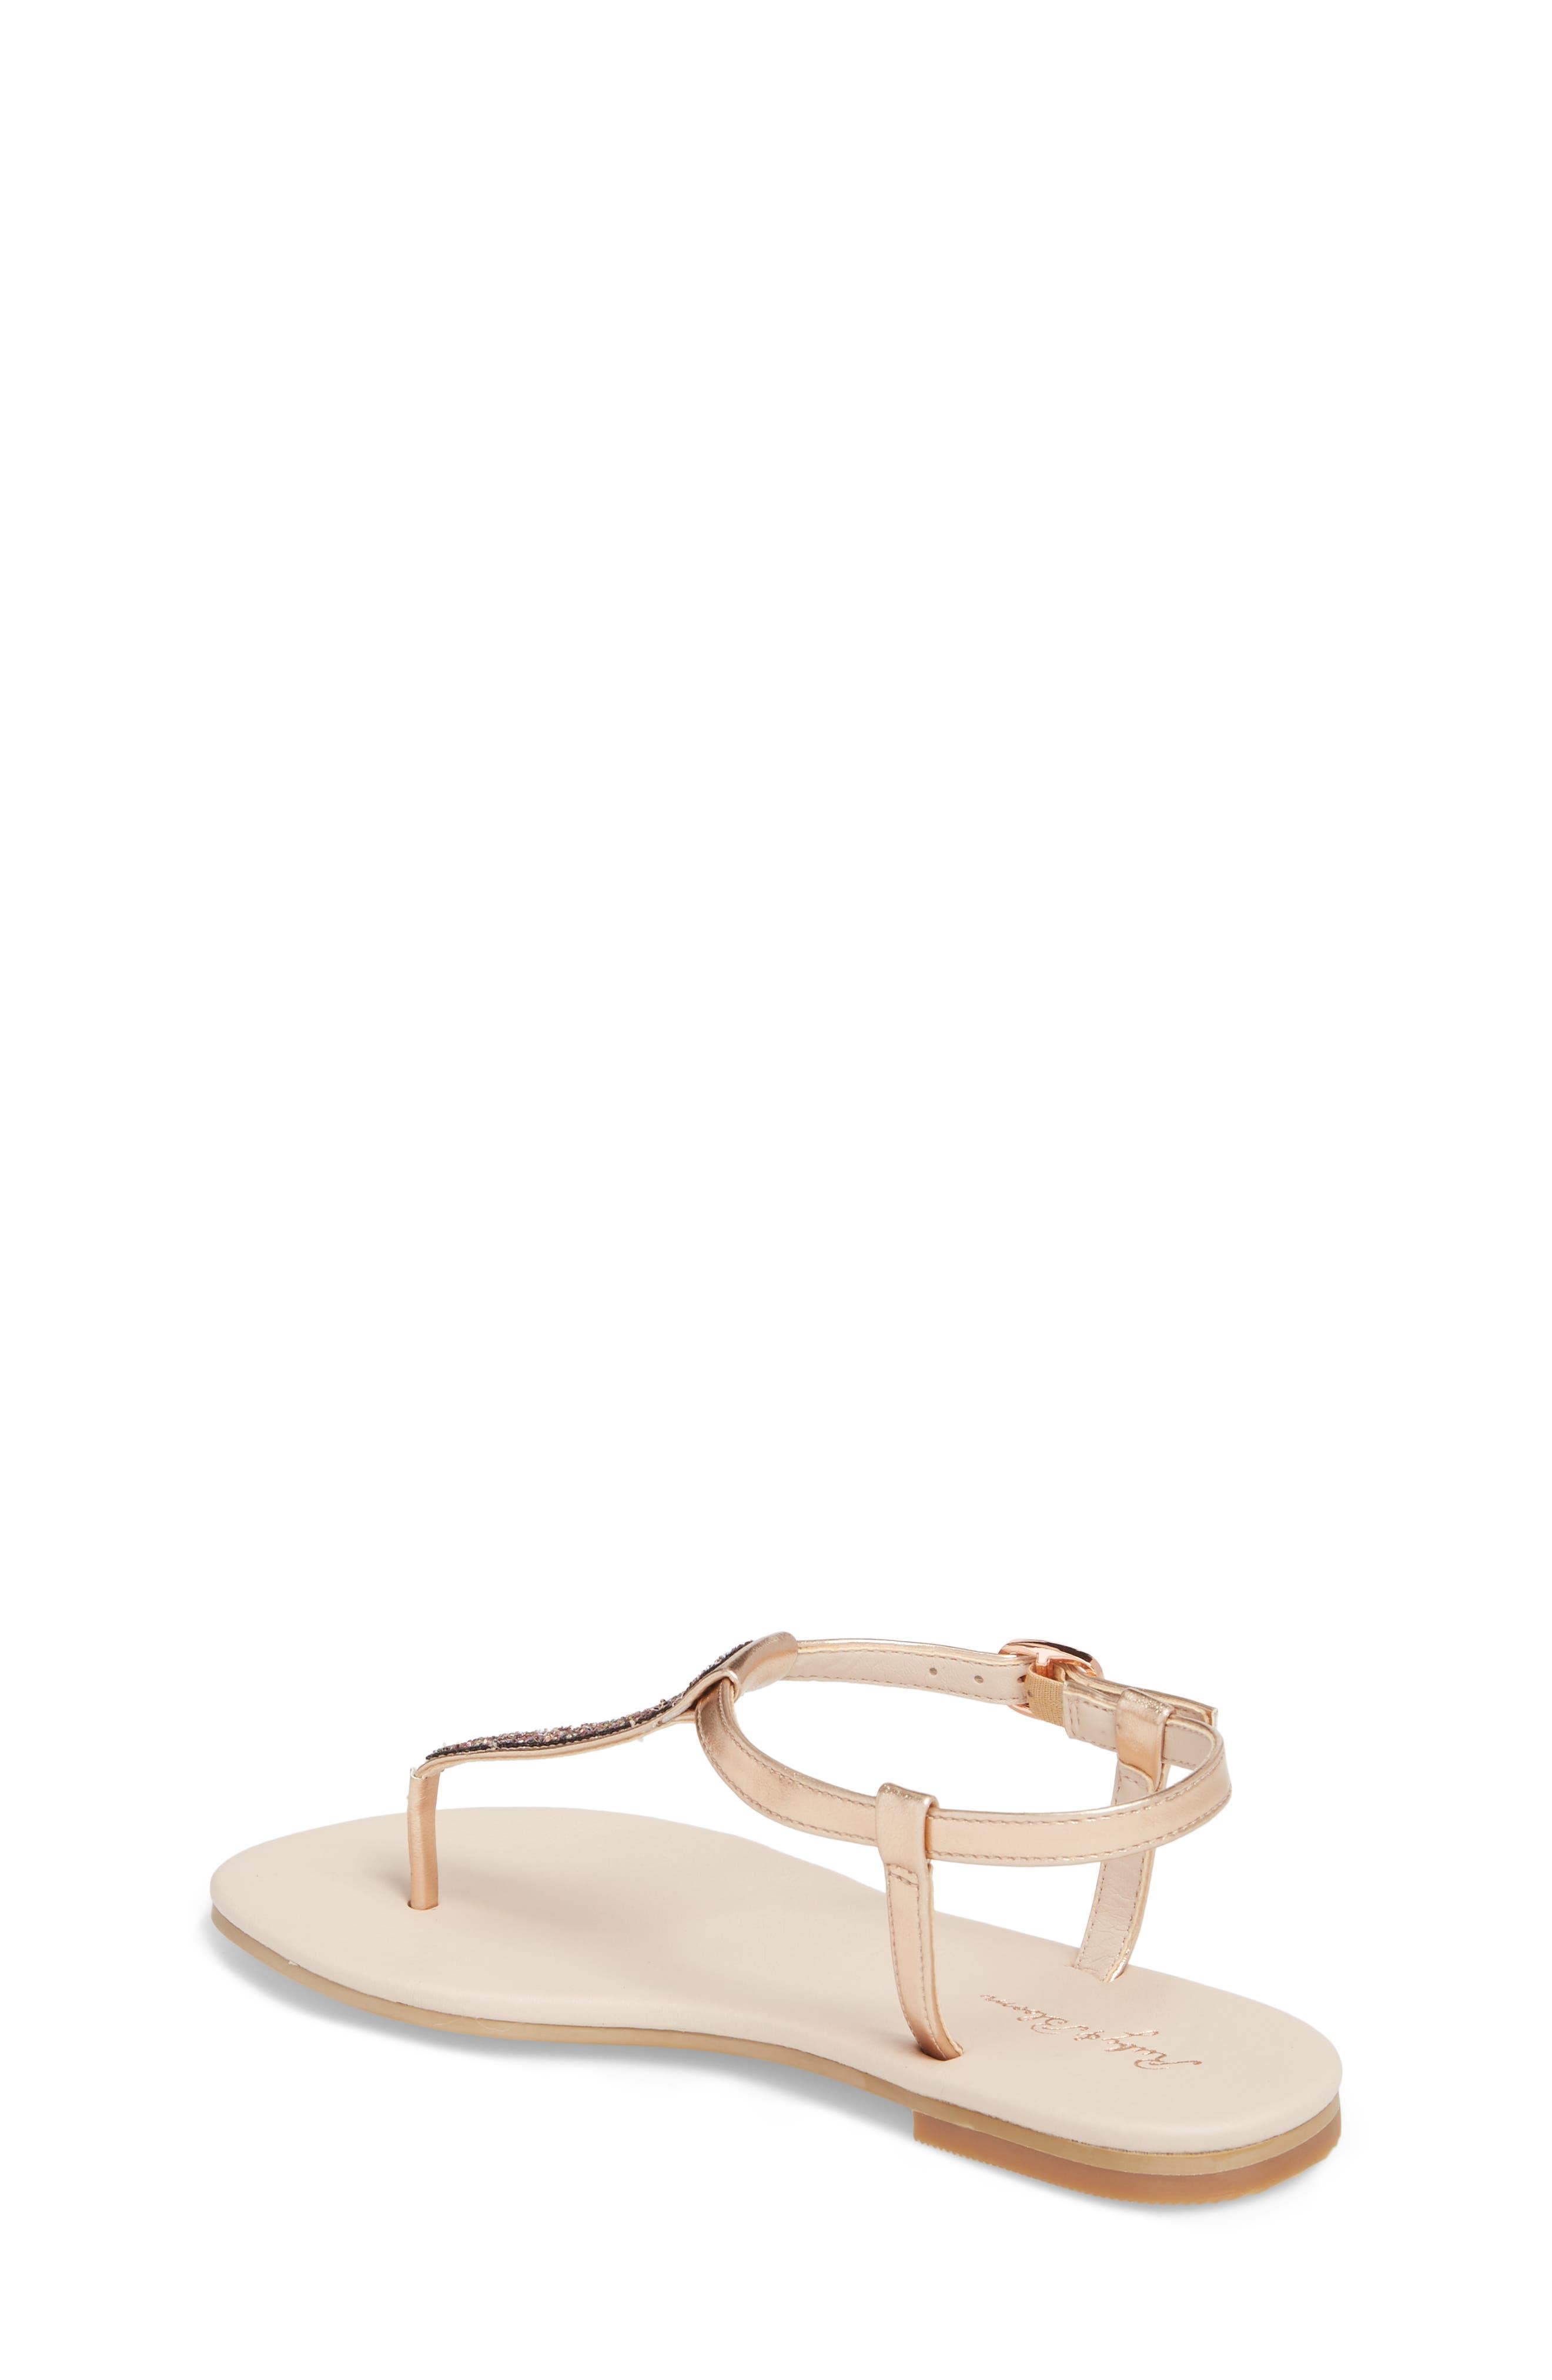 Noe Glitter T-Strap Sandal Sandal,                             Alternate thumbnail 2, color,                             ROSE GOLD FAUX LEA